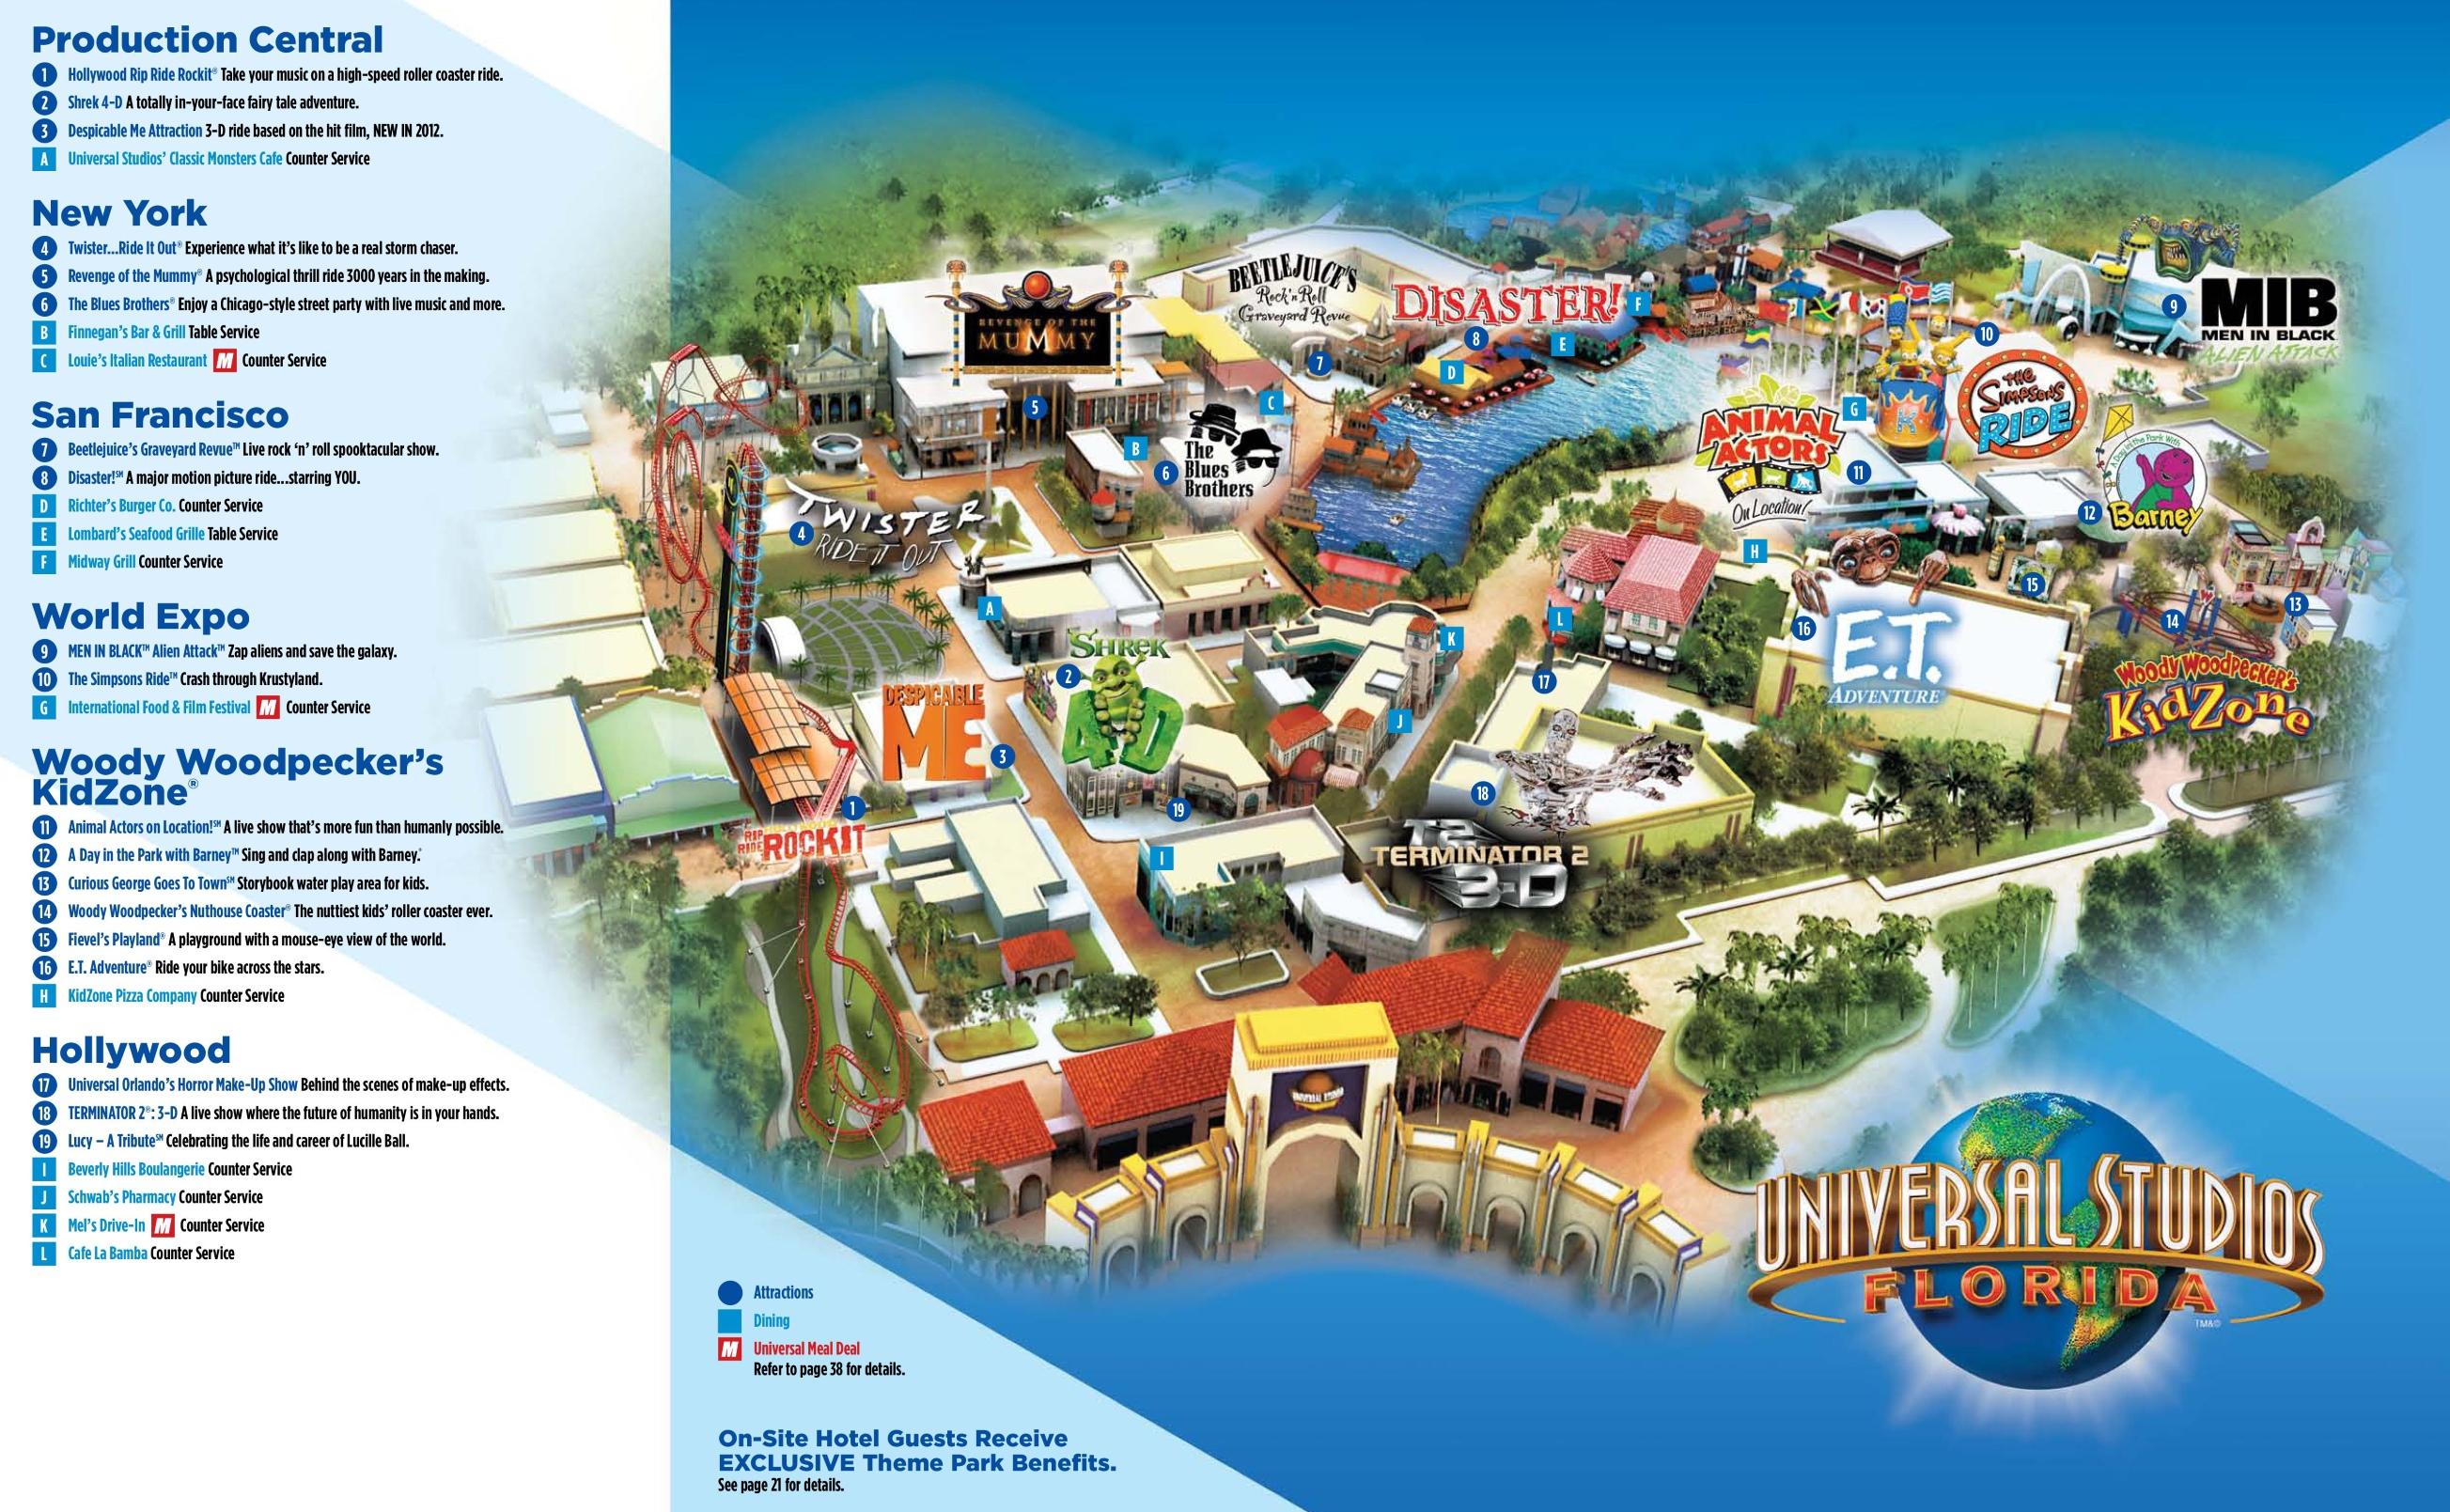 Orlando Universal Studios Florida Map Map Hd Universal Studios Map - Universal Orlando Florida Map